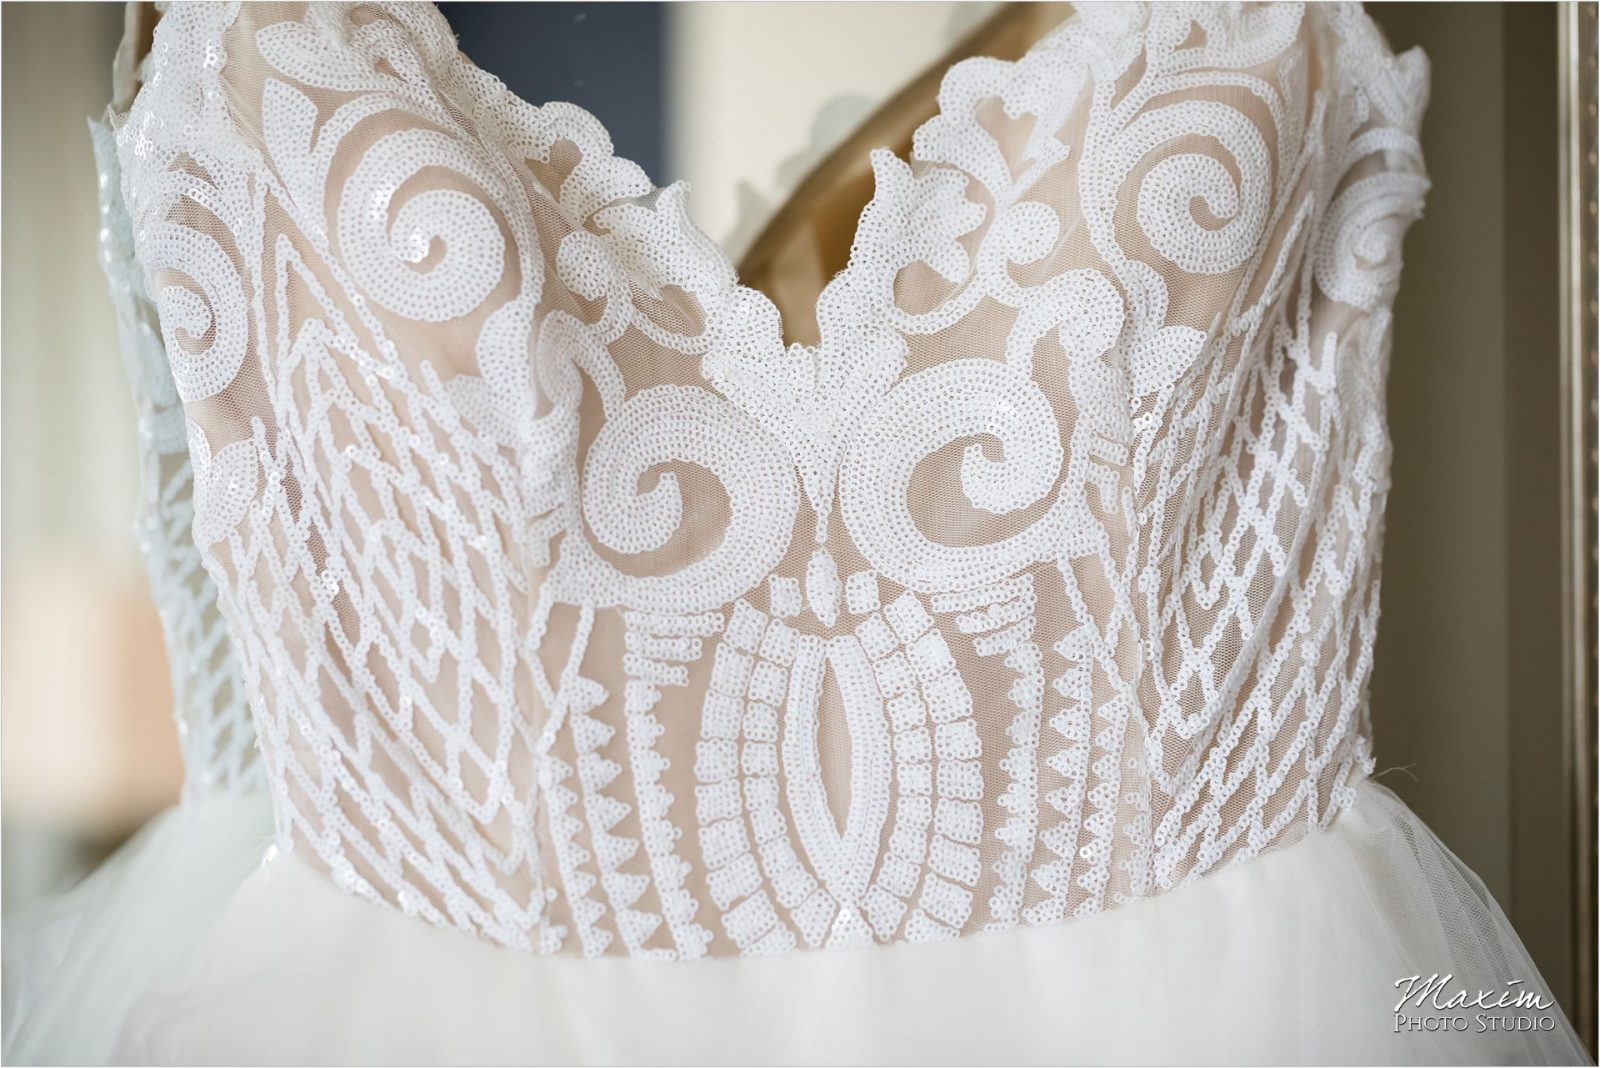 Hyde Park Bridal Cincinnati Wedding Dress